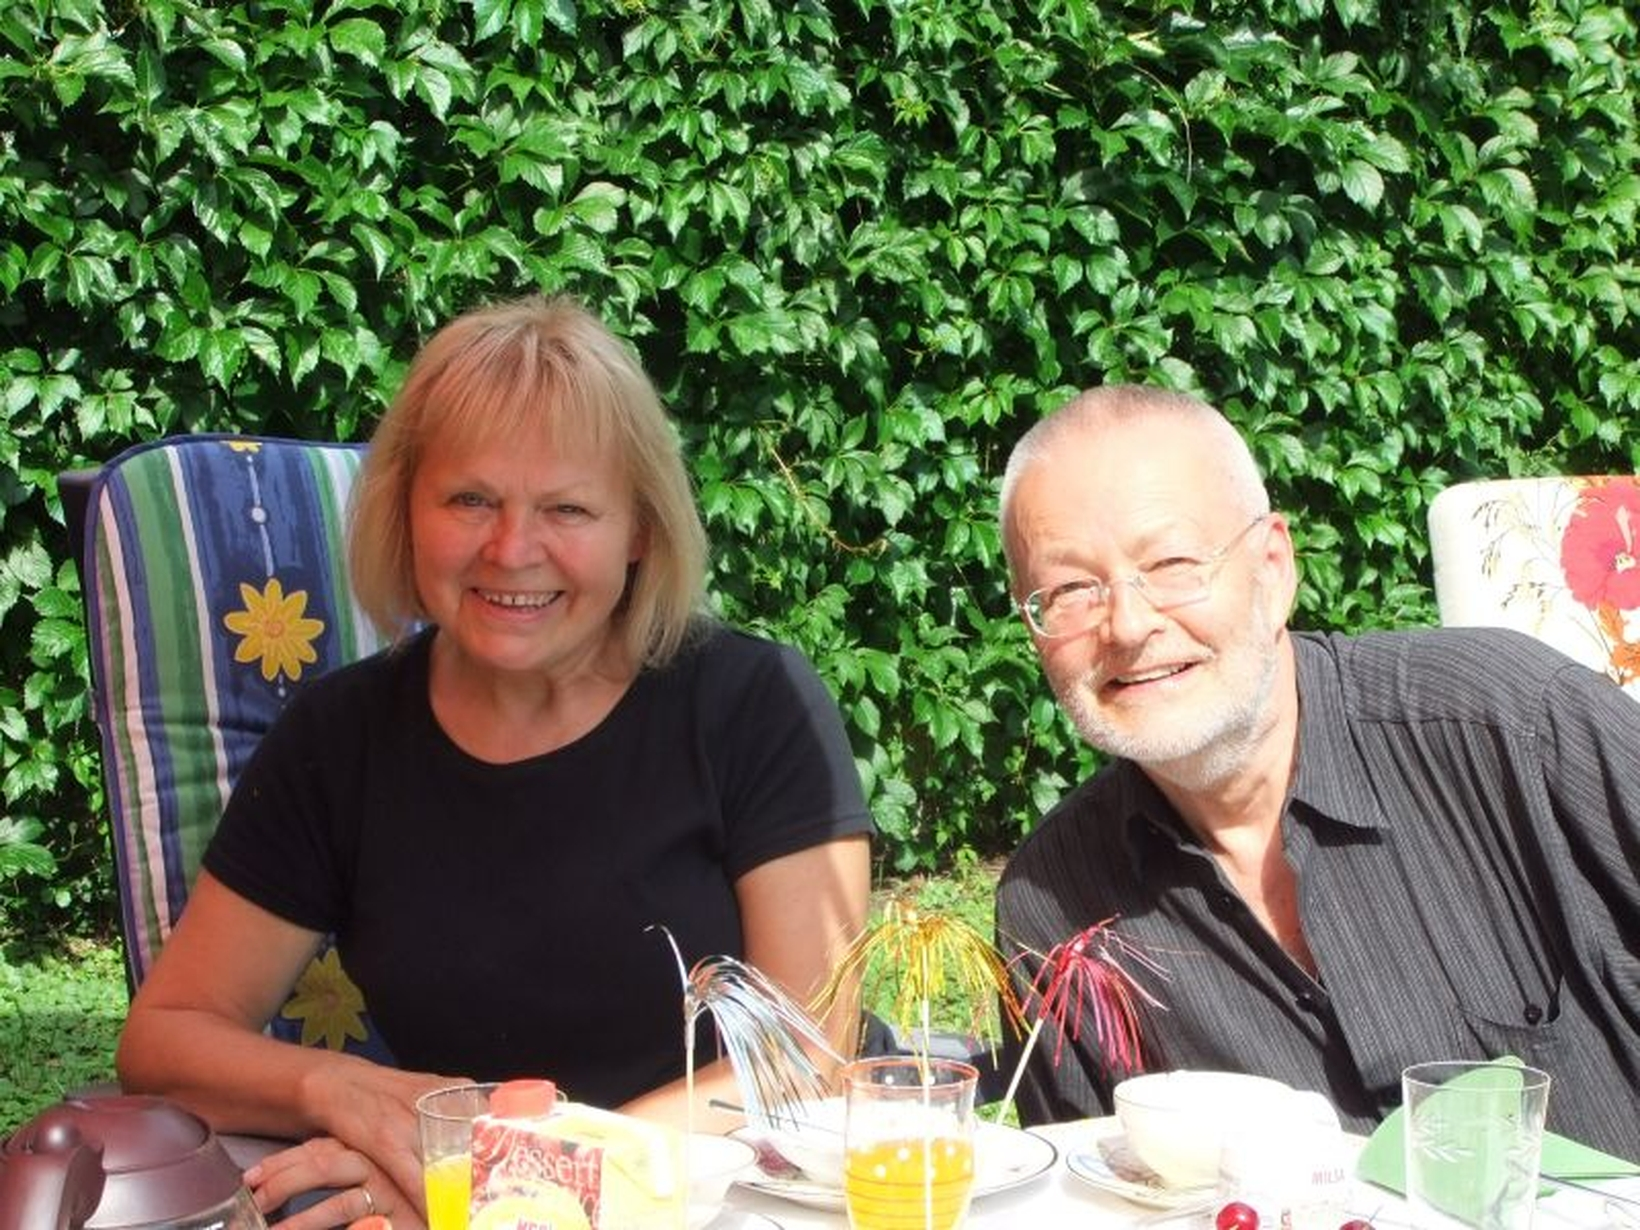 Bernd & Ursula from Dresden, Germany